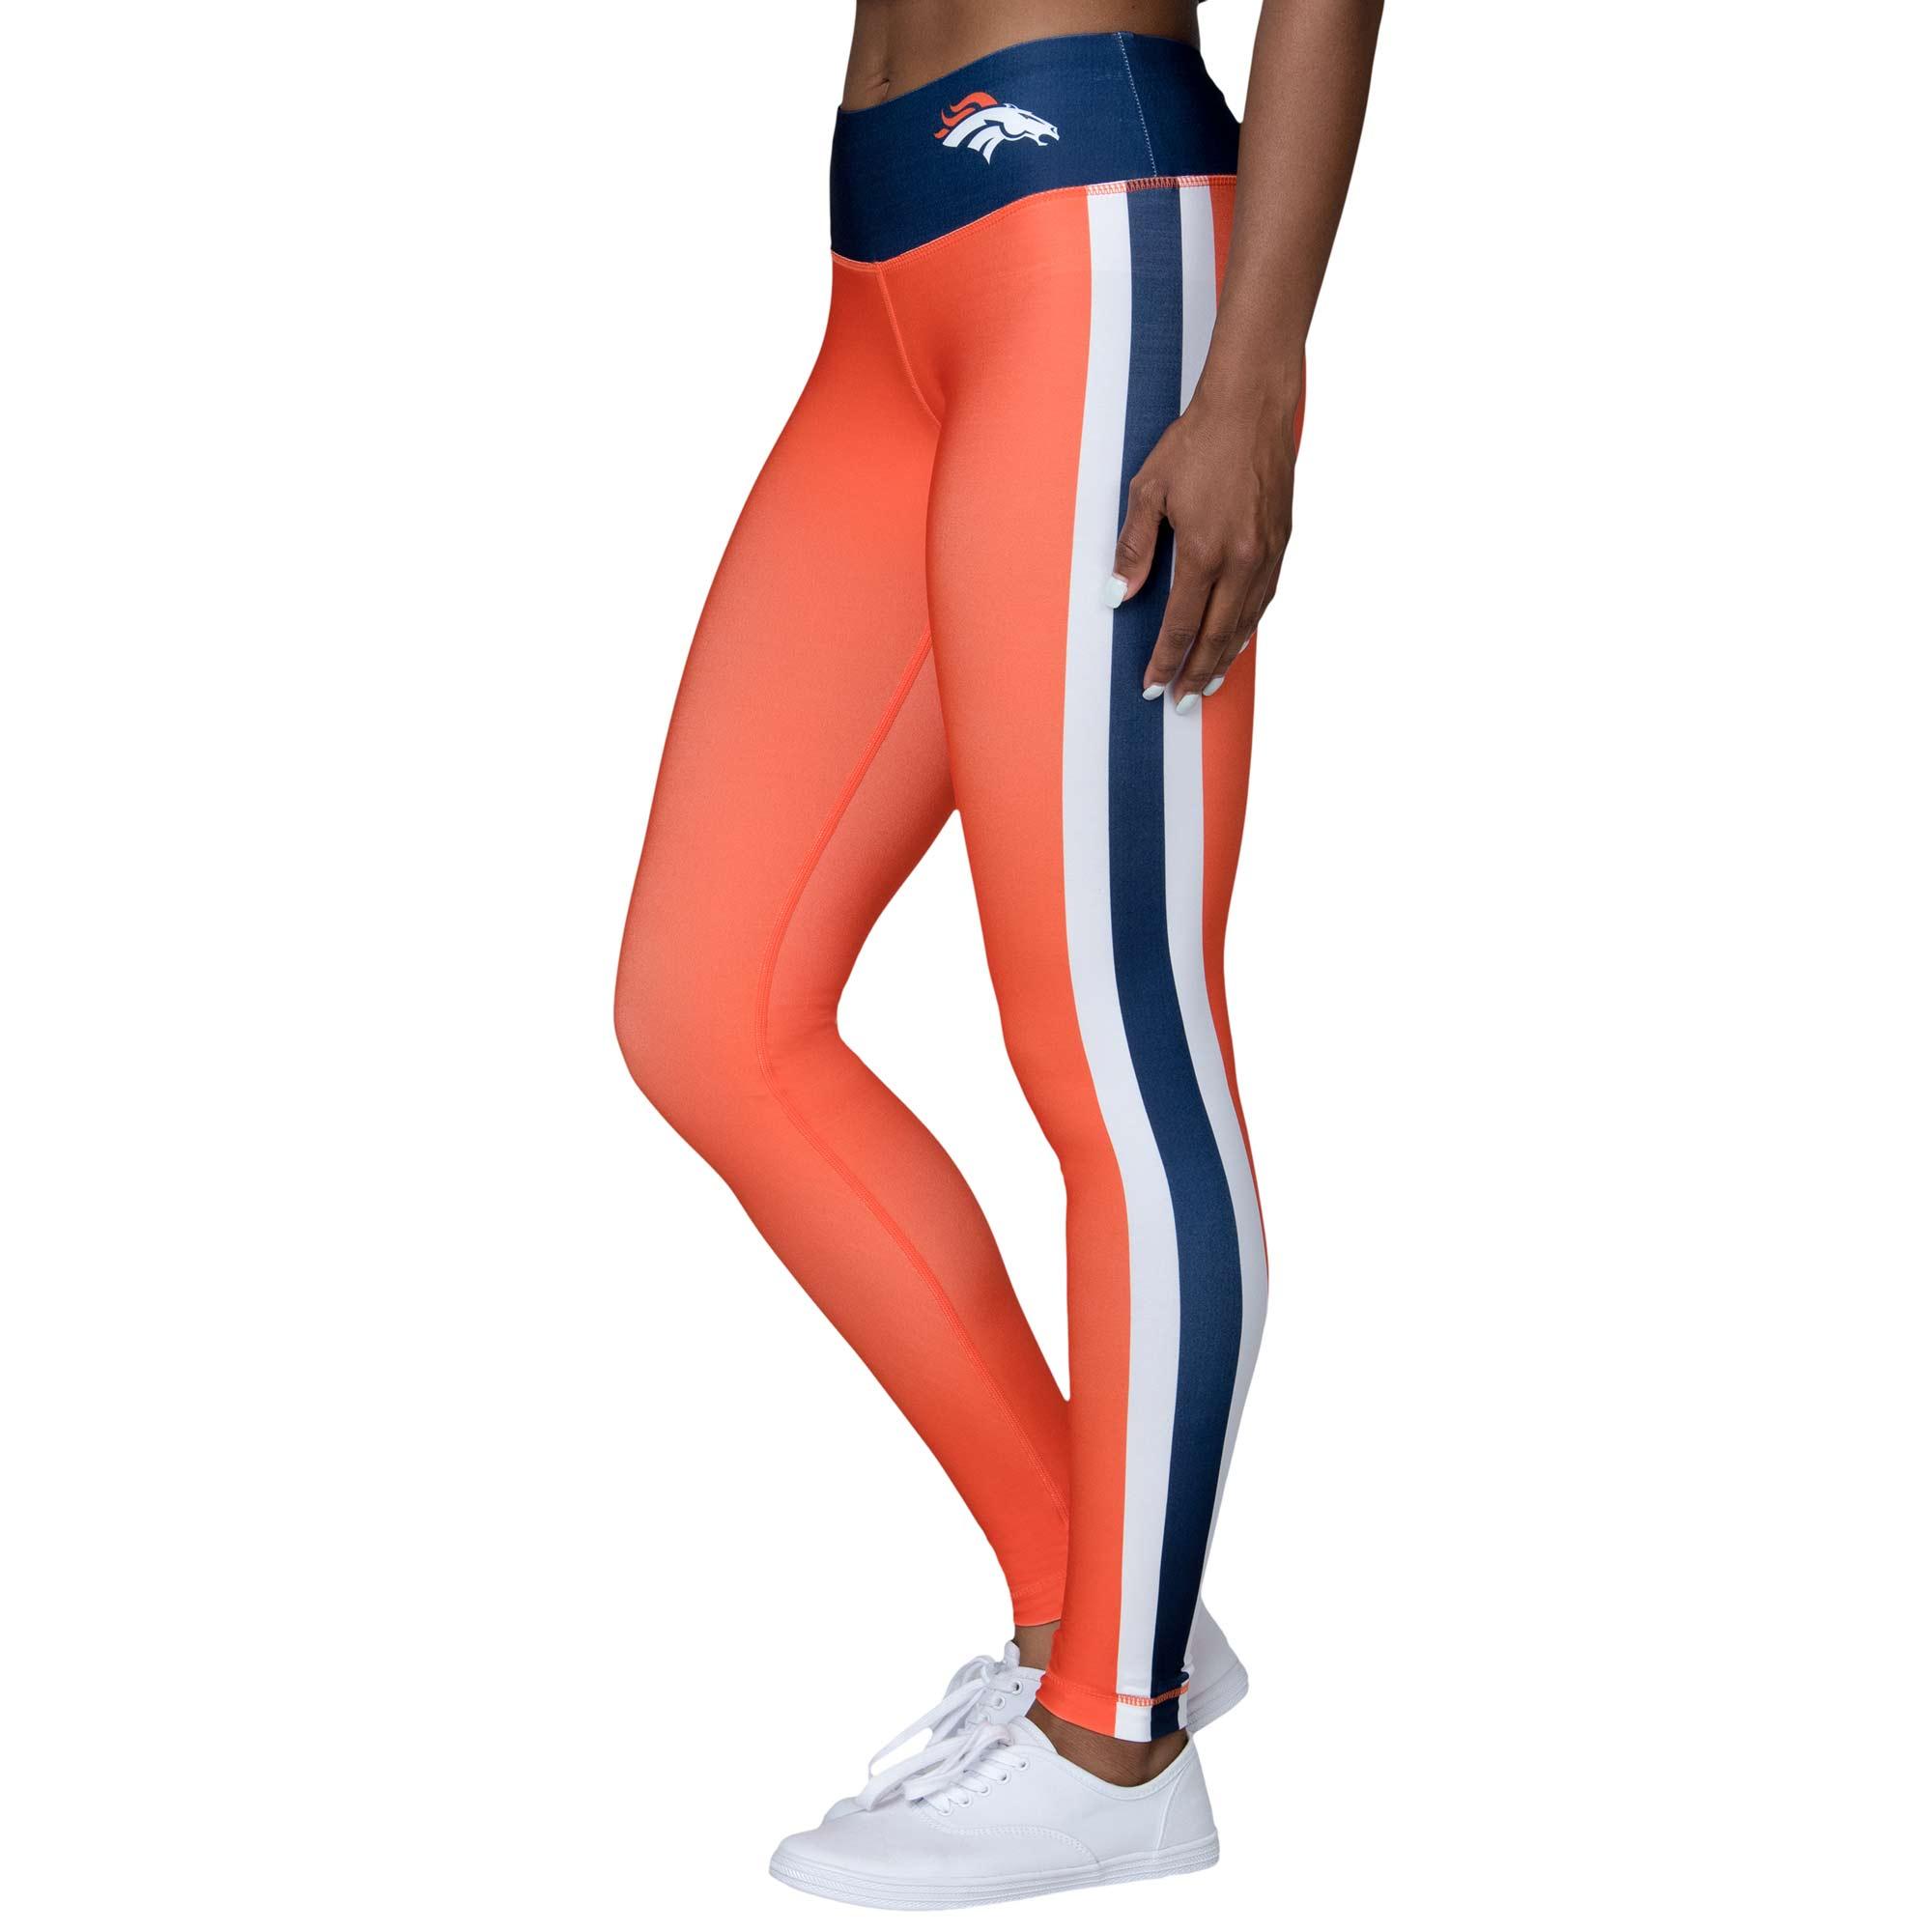 Denver Broncos Women's Uniform Leggings - Orange